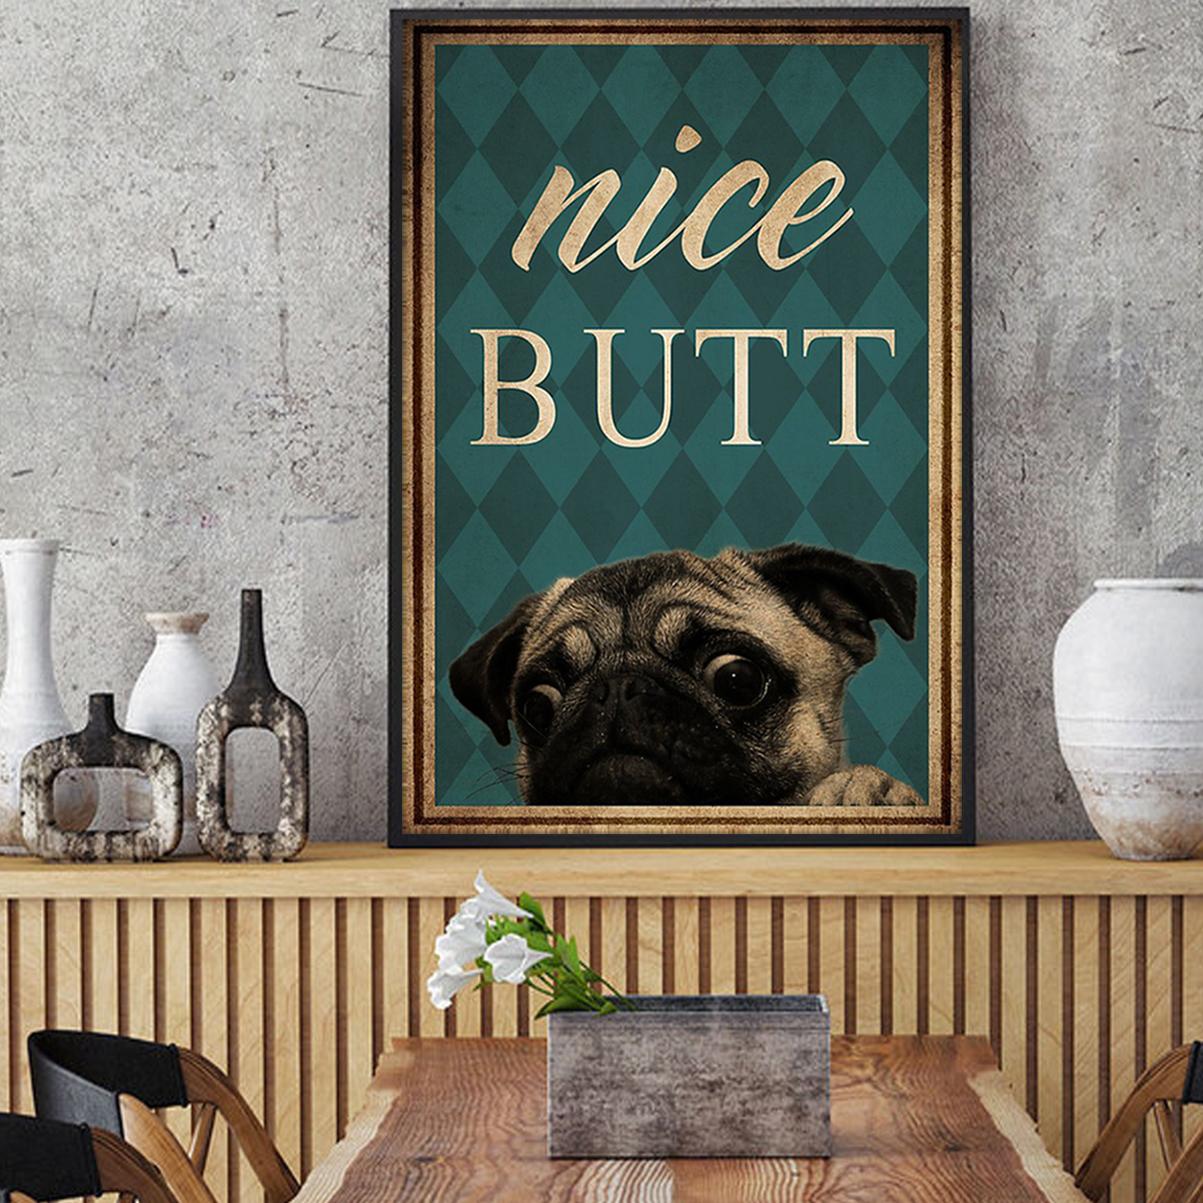 Pug nice butt poster